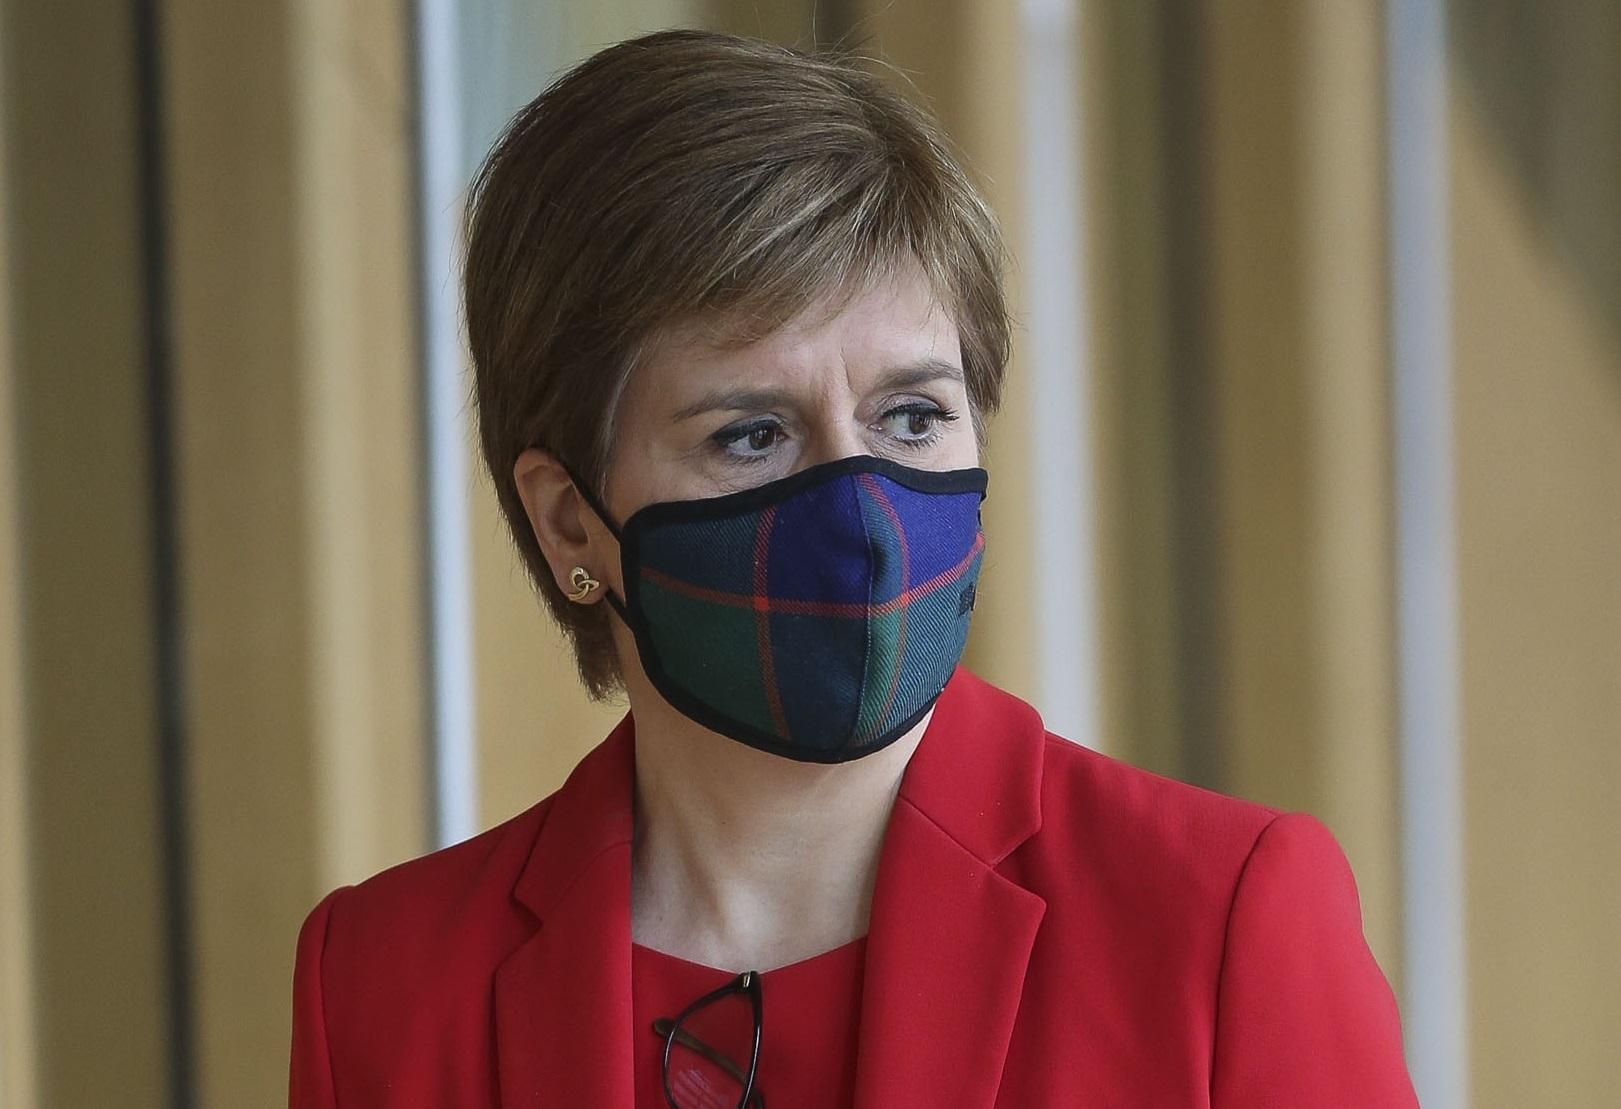 Covid Scotland: Nicola Sturgeon confirms no lockdown changes this week